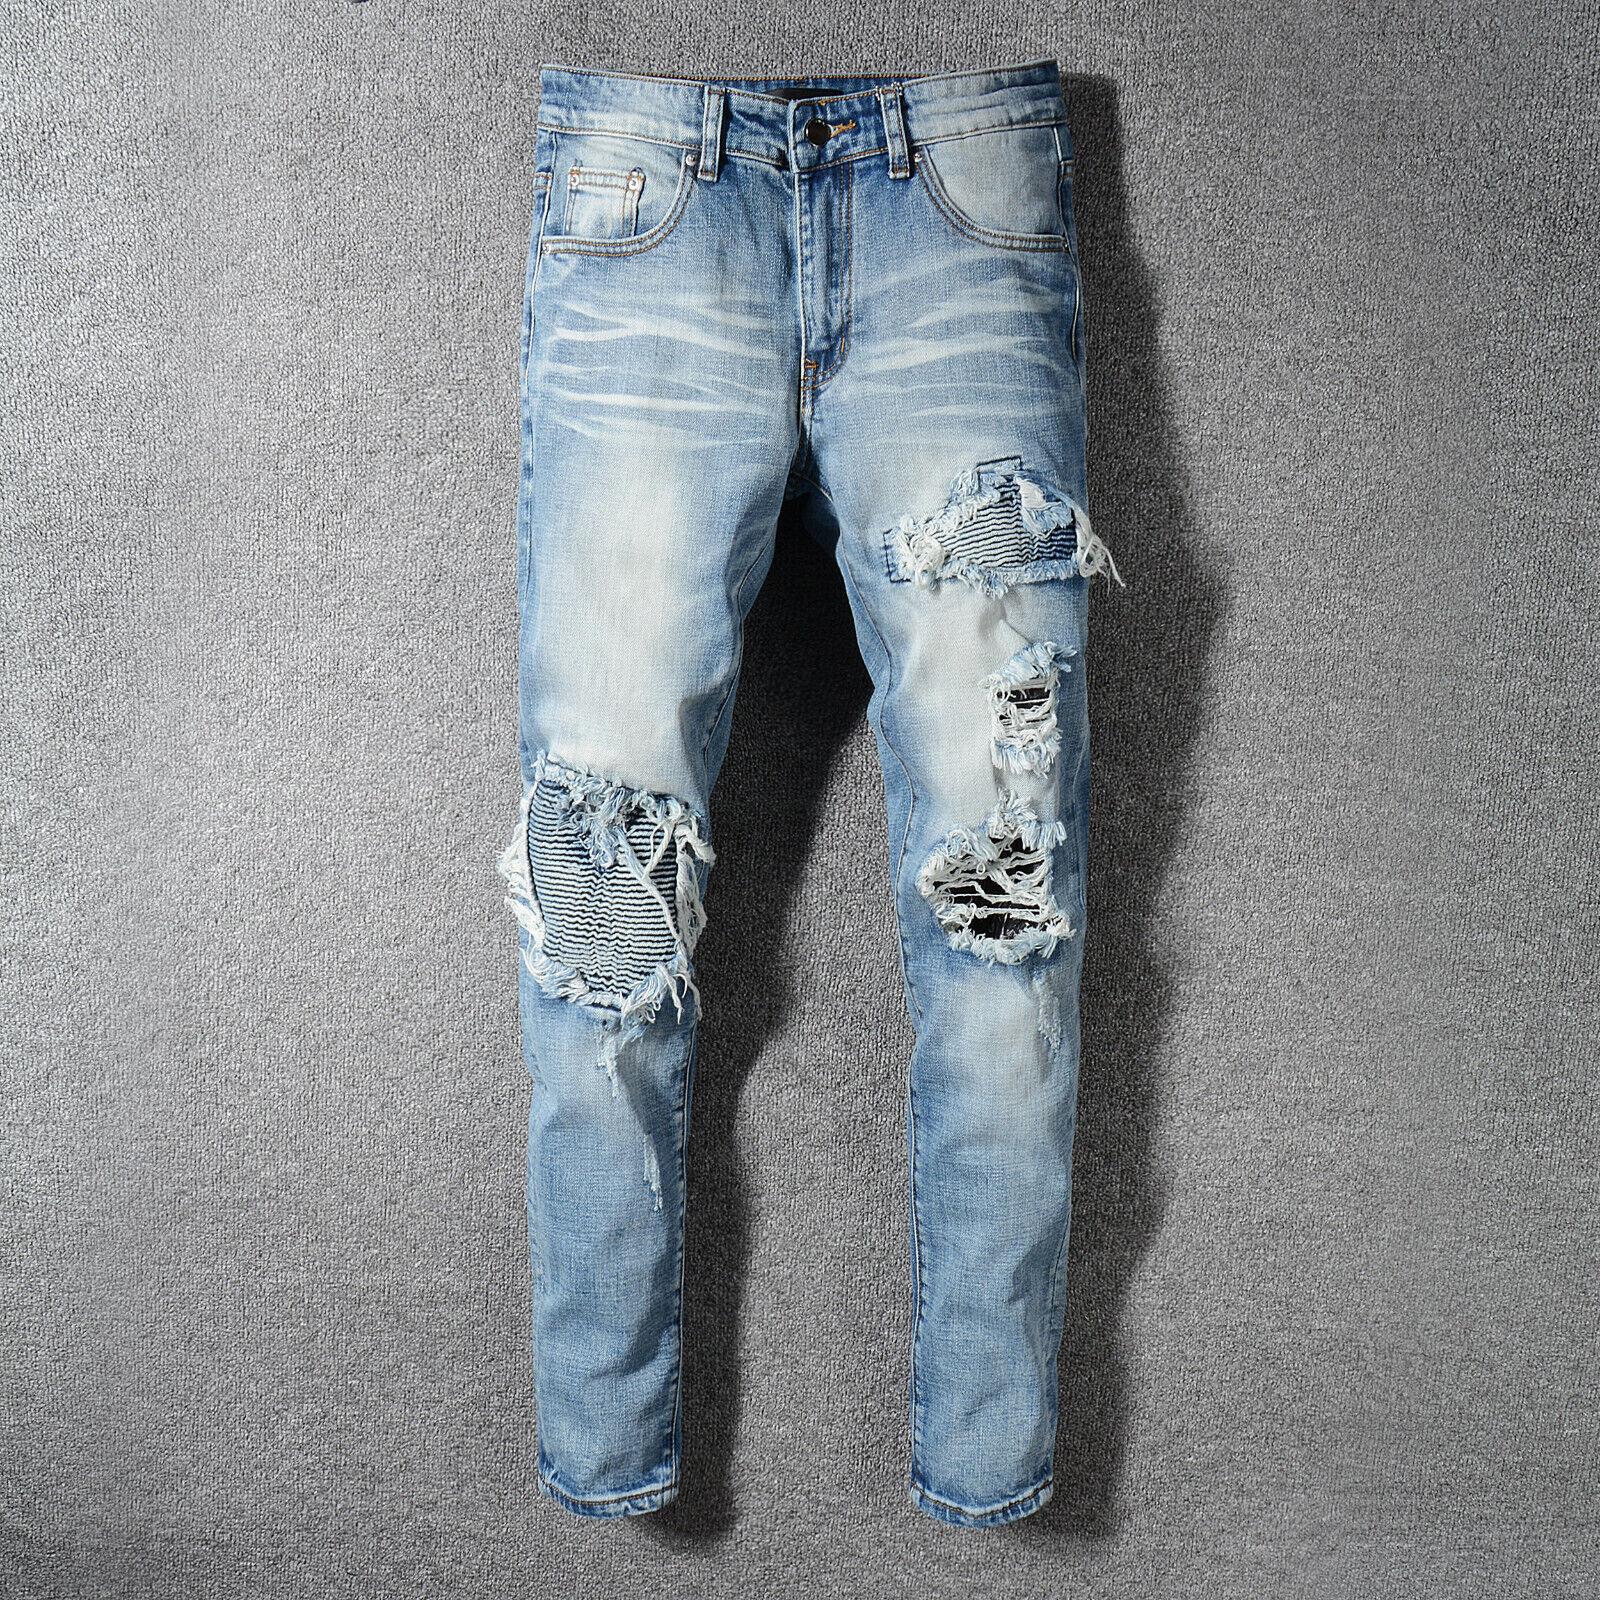 HI-Q Pop Broken Hole Patchwork Stylish Snake Pattern Embroidery Blue Denim Jeans